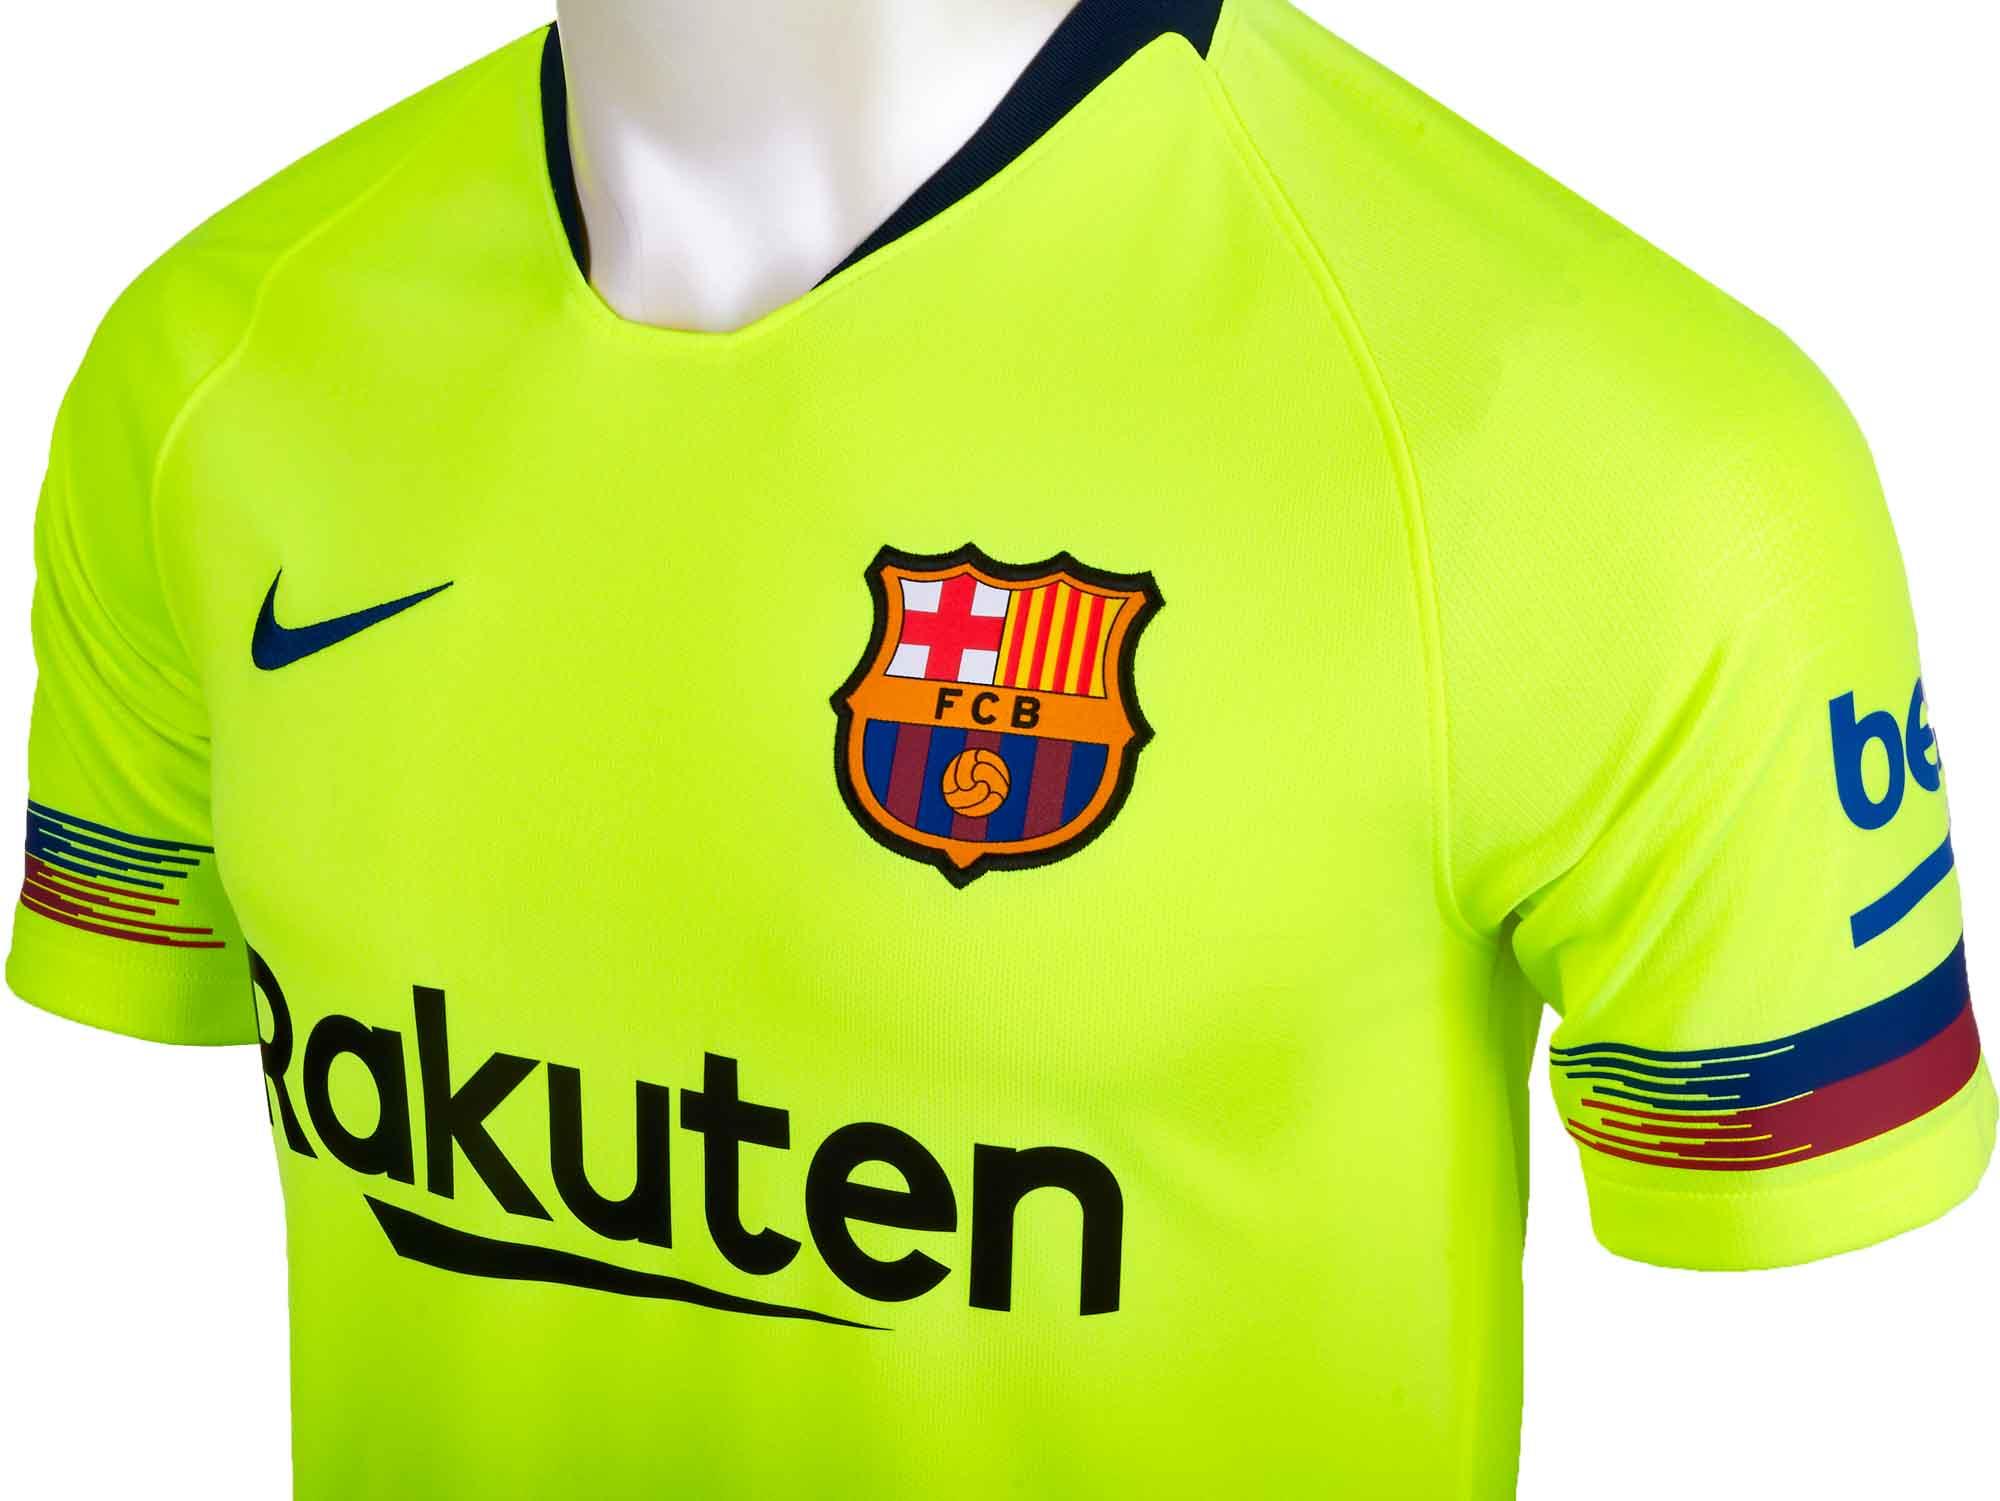 sale retailer b201b 71b89 2018/19 Kids Nike Lionel Messi Barcelona Away Jersey - SoccerPro